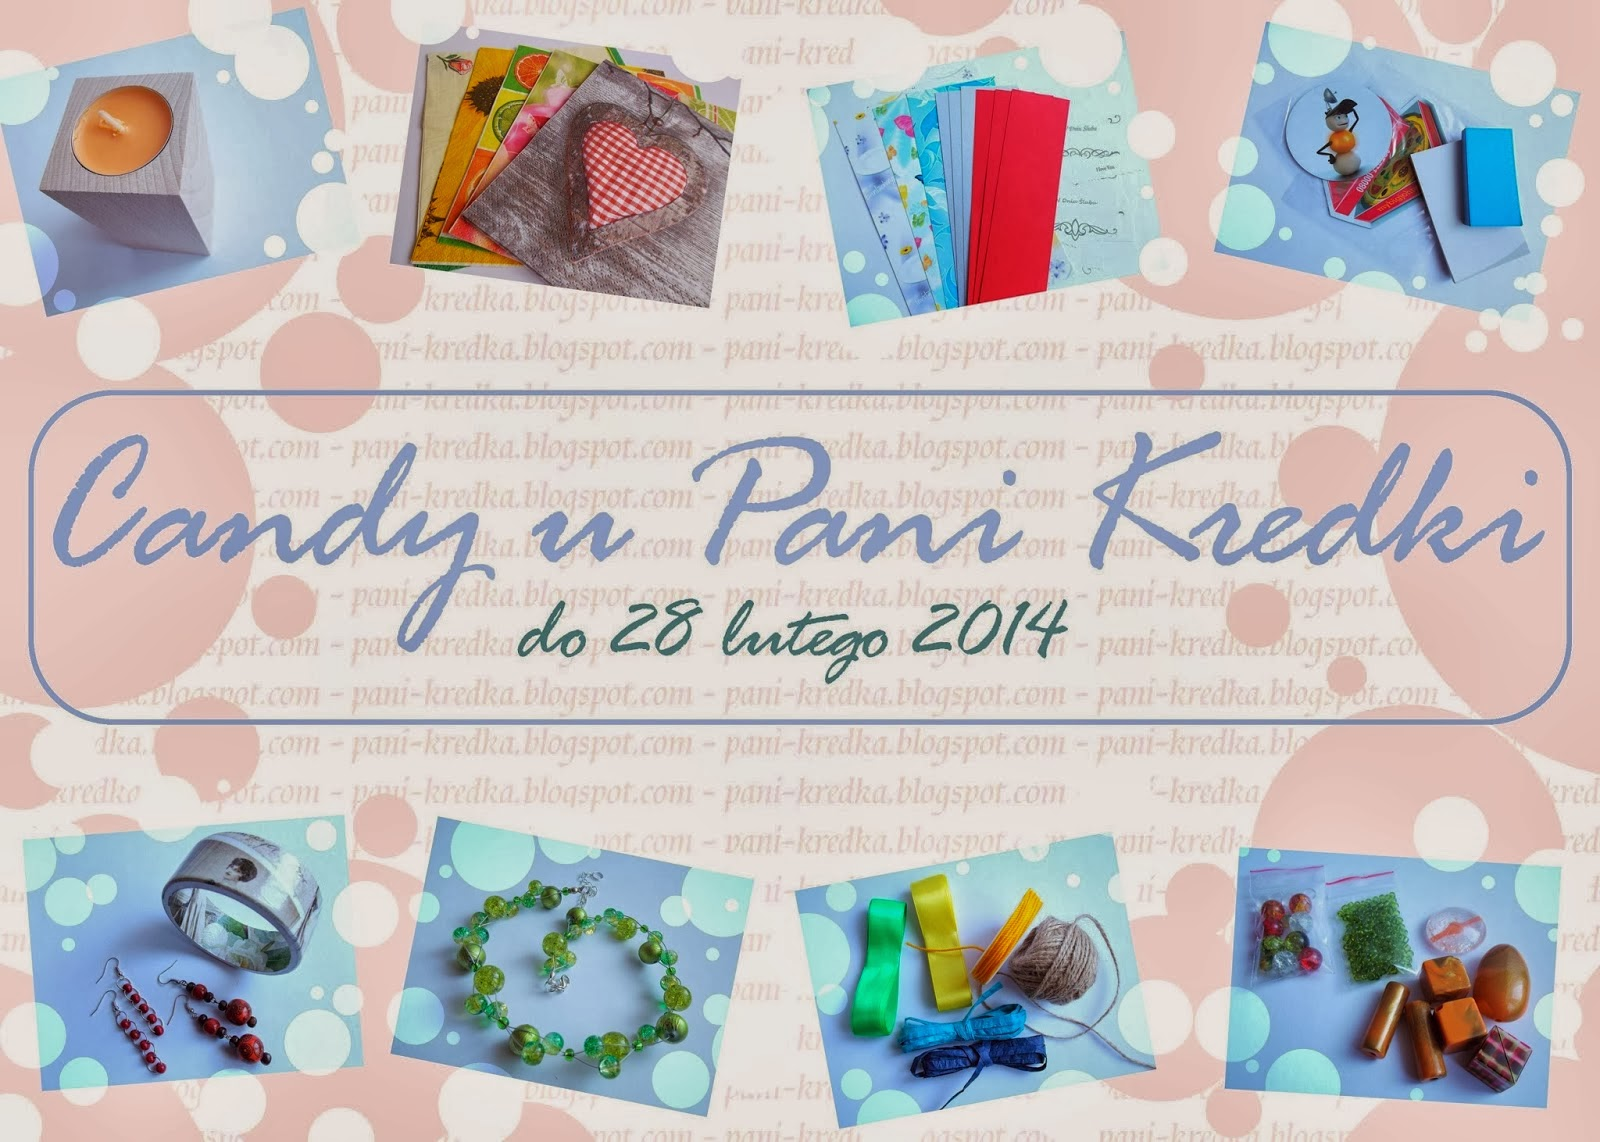 http://pani-kredka.blogspot.com/2014/02/moje-pierwsze-candy.html